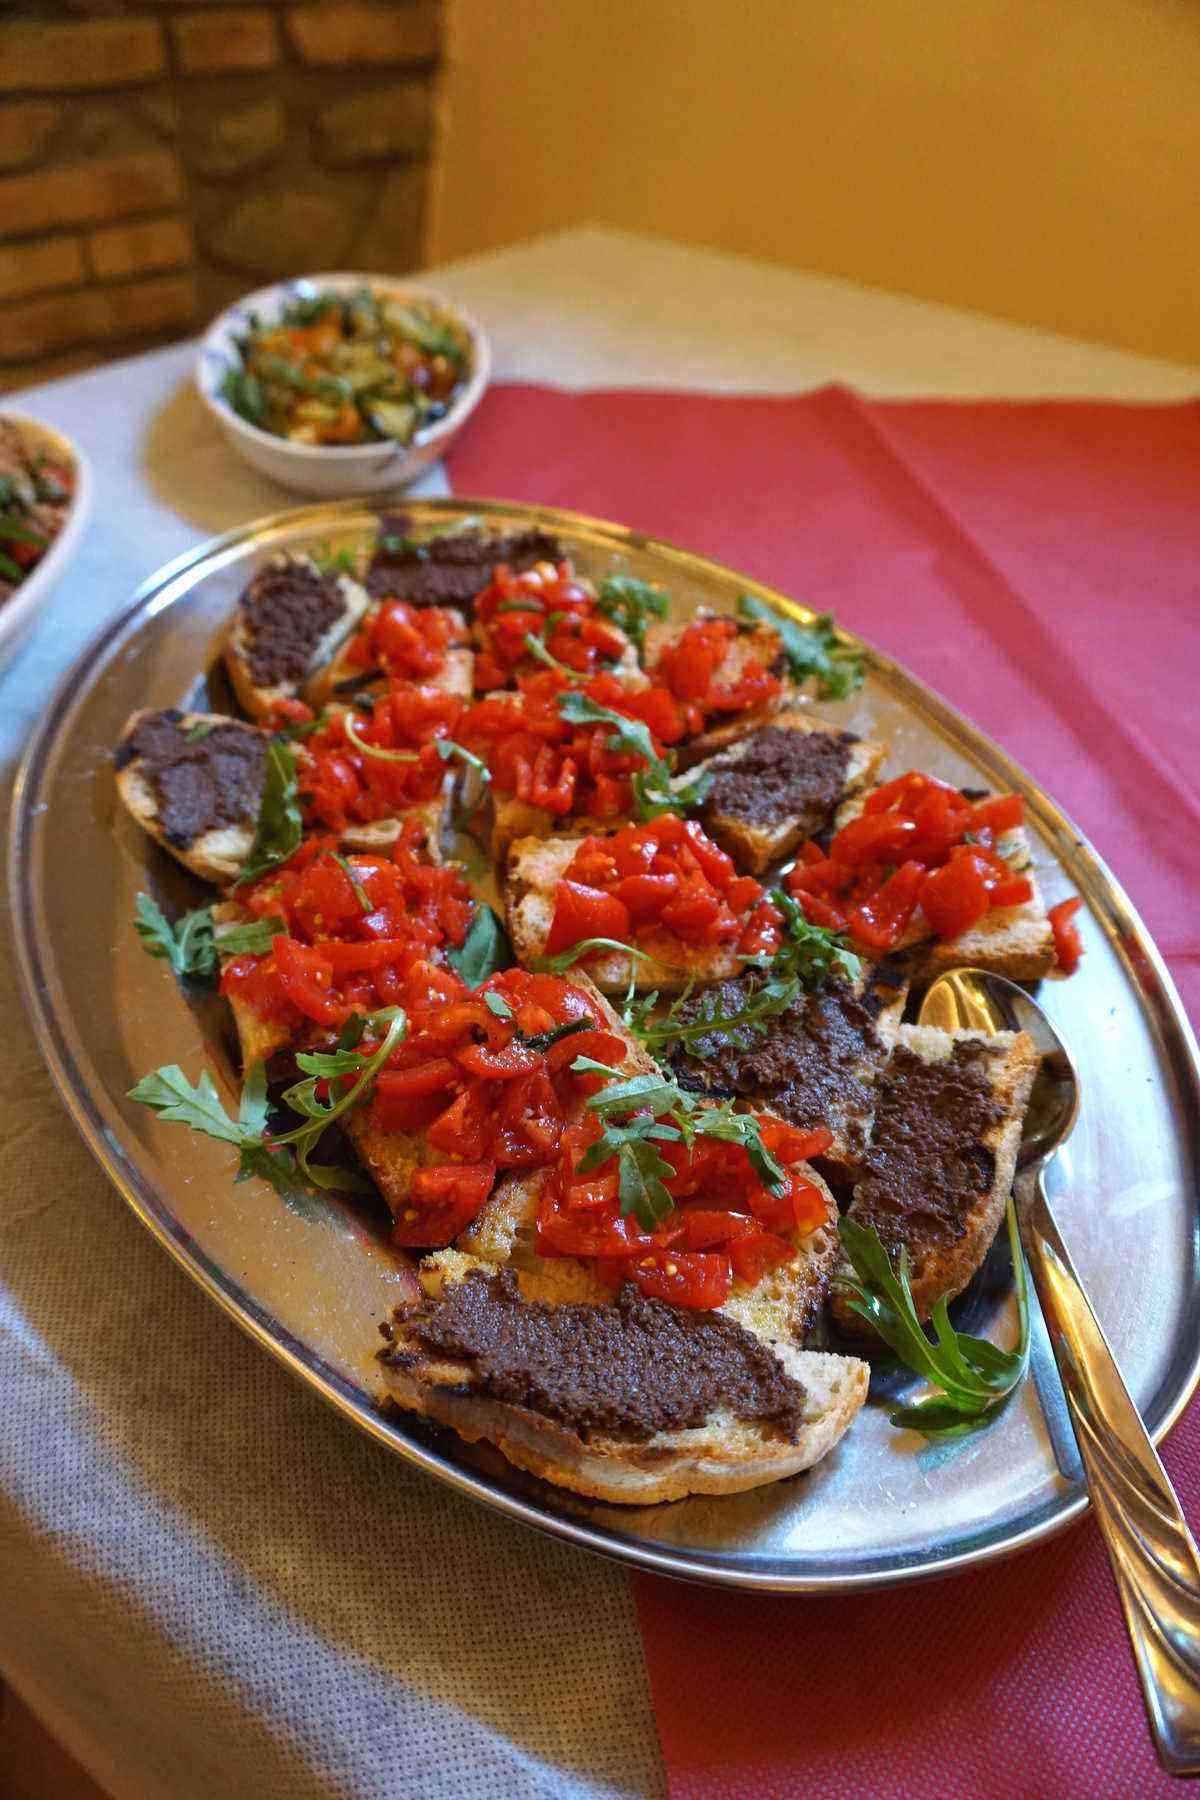 4. Bruschetta and olive tapenade